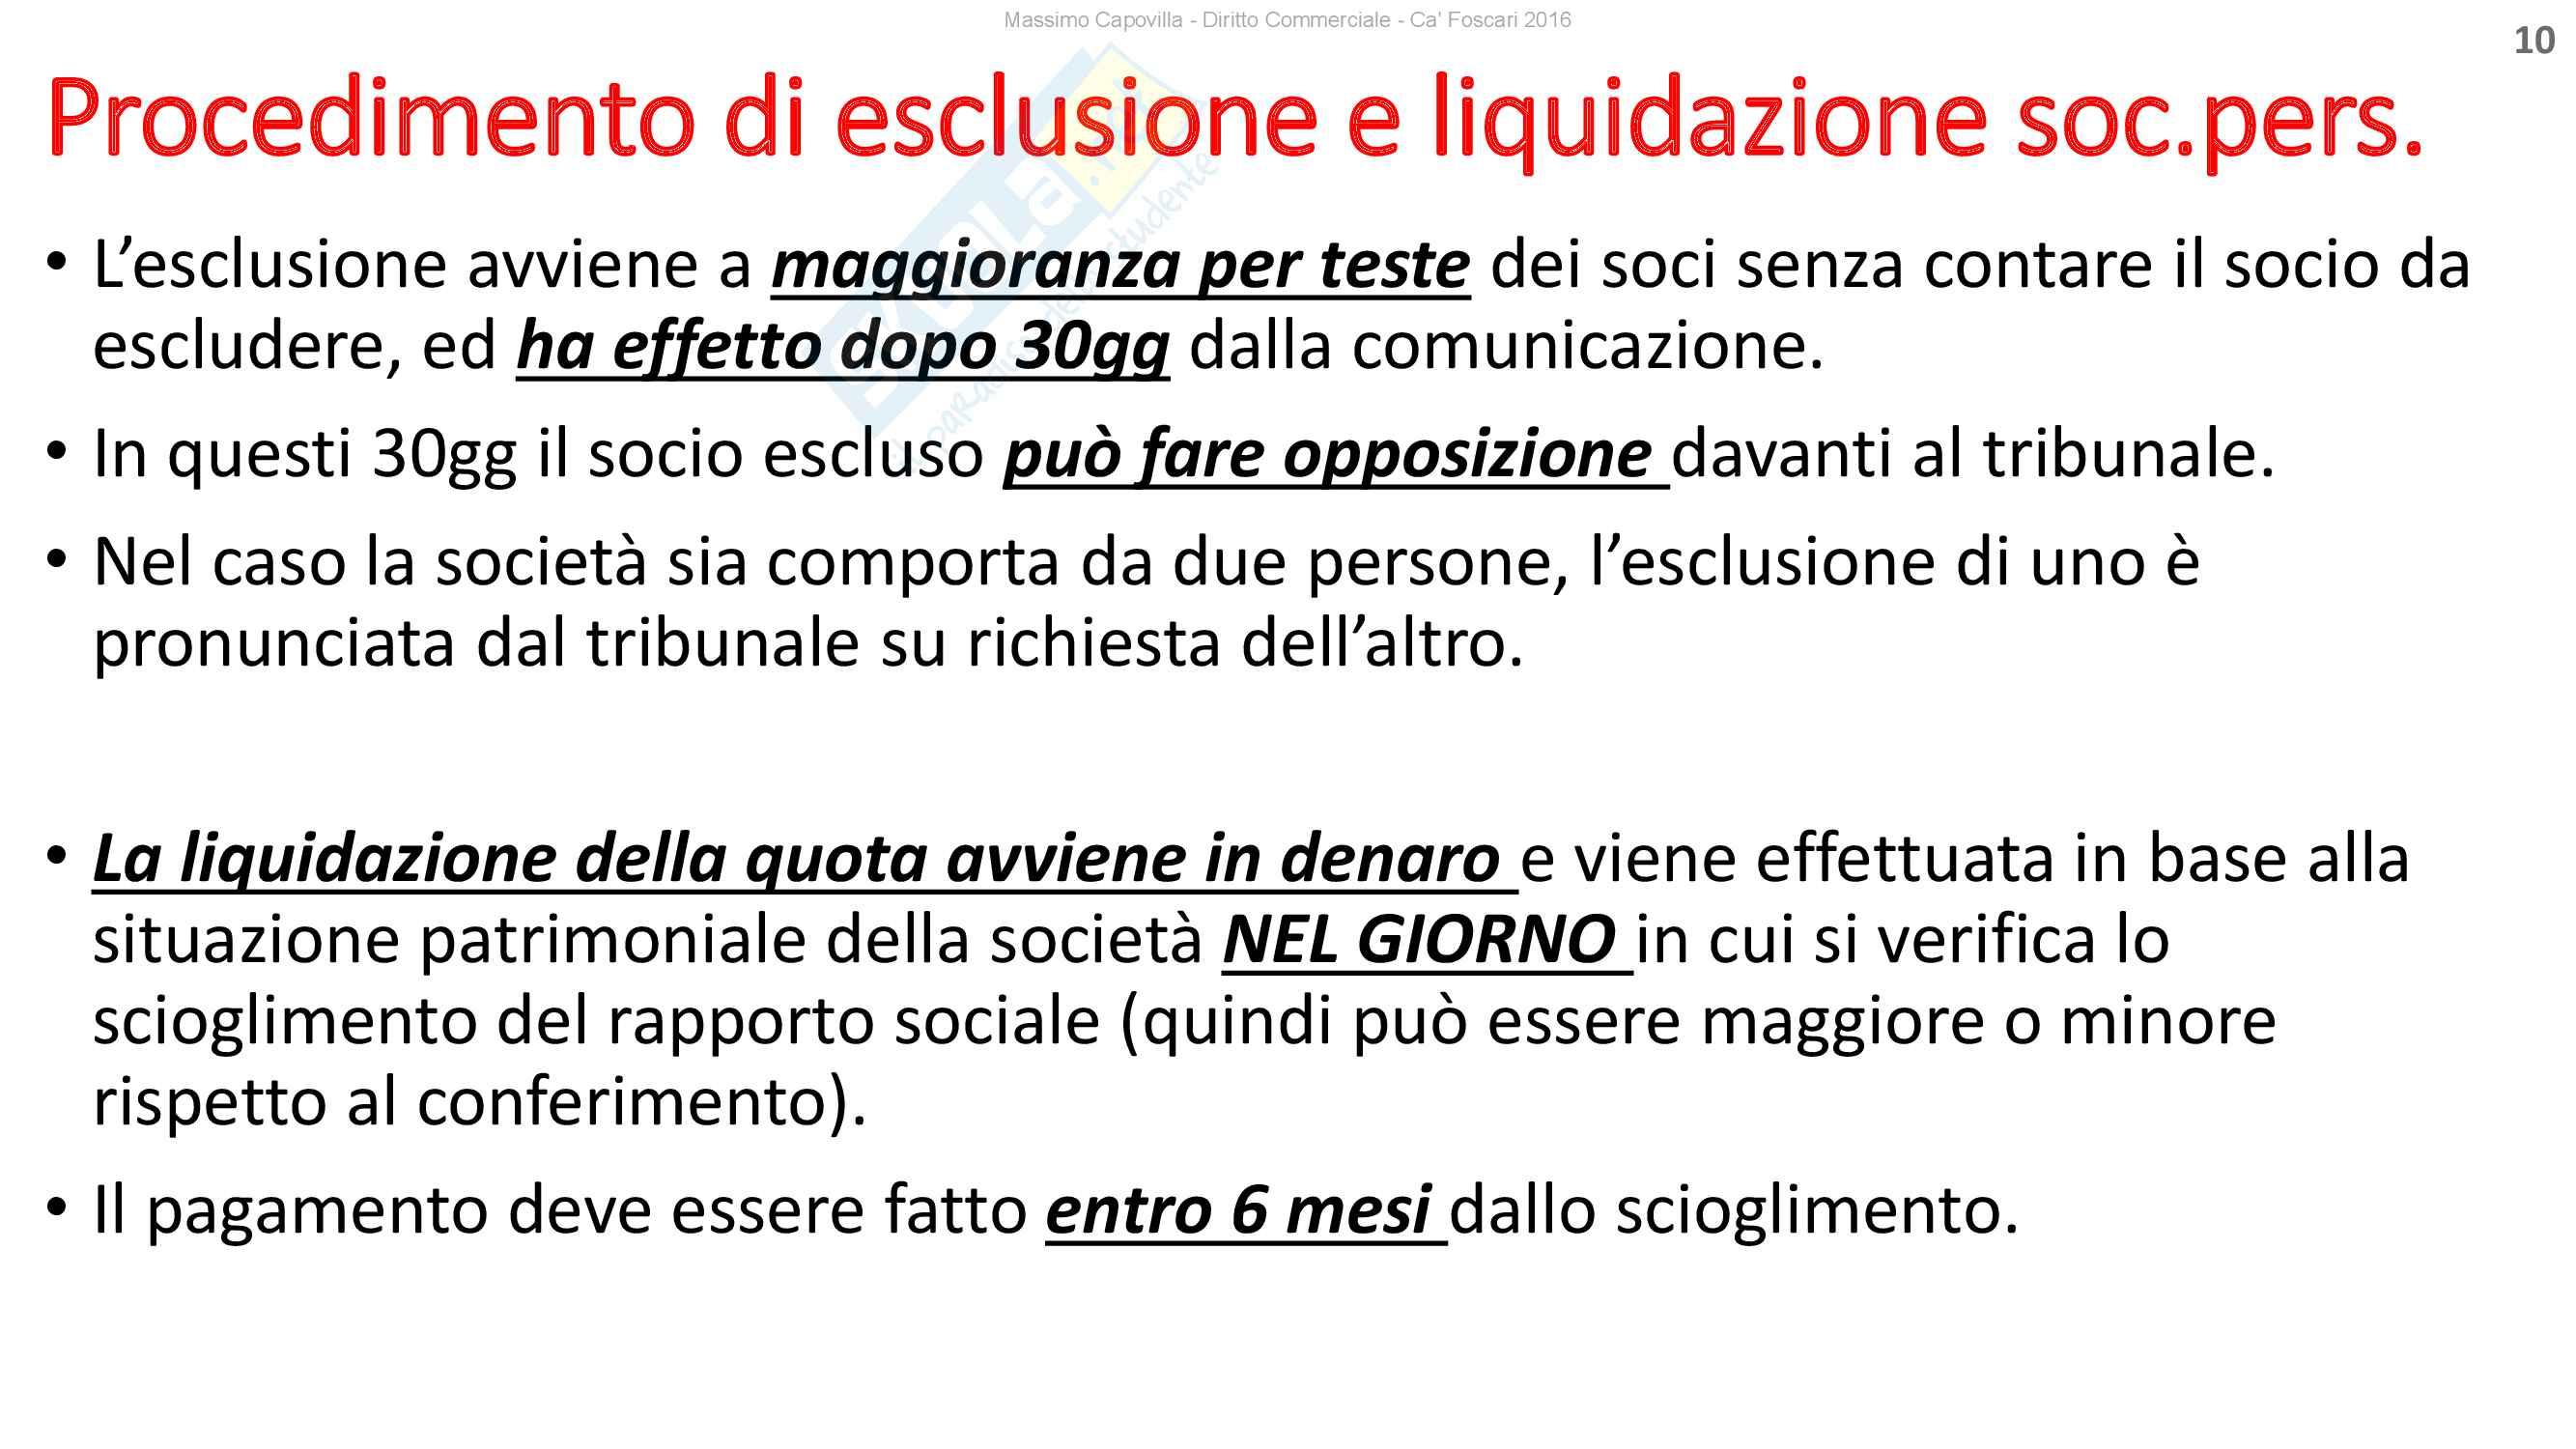 Diritto Commerciale, Domande e Risposte, Lorenzo De Angelis Pag. 11